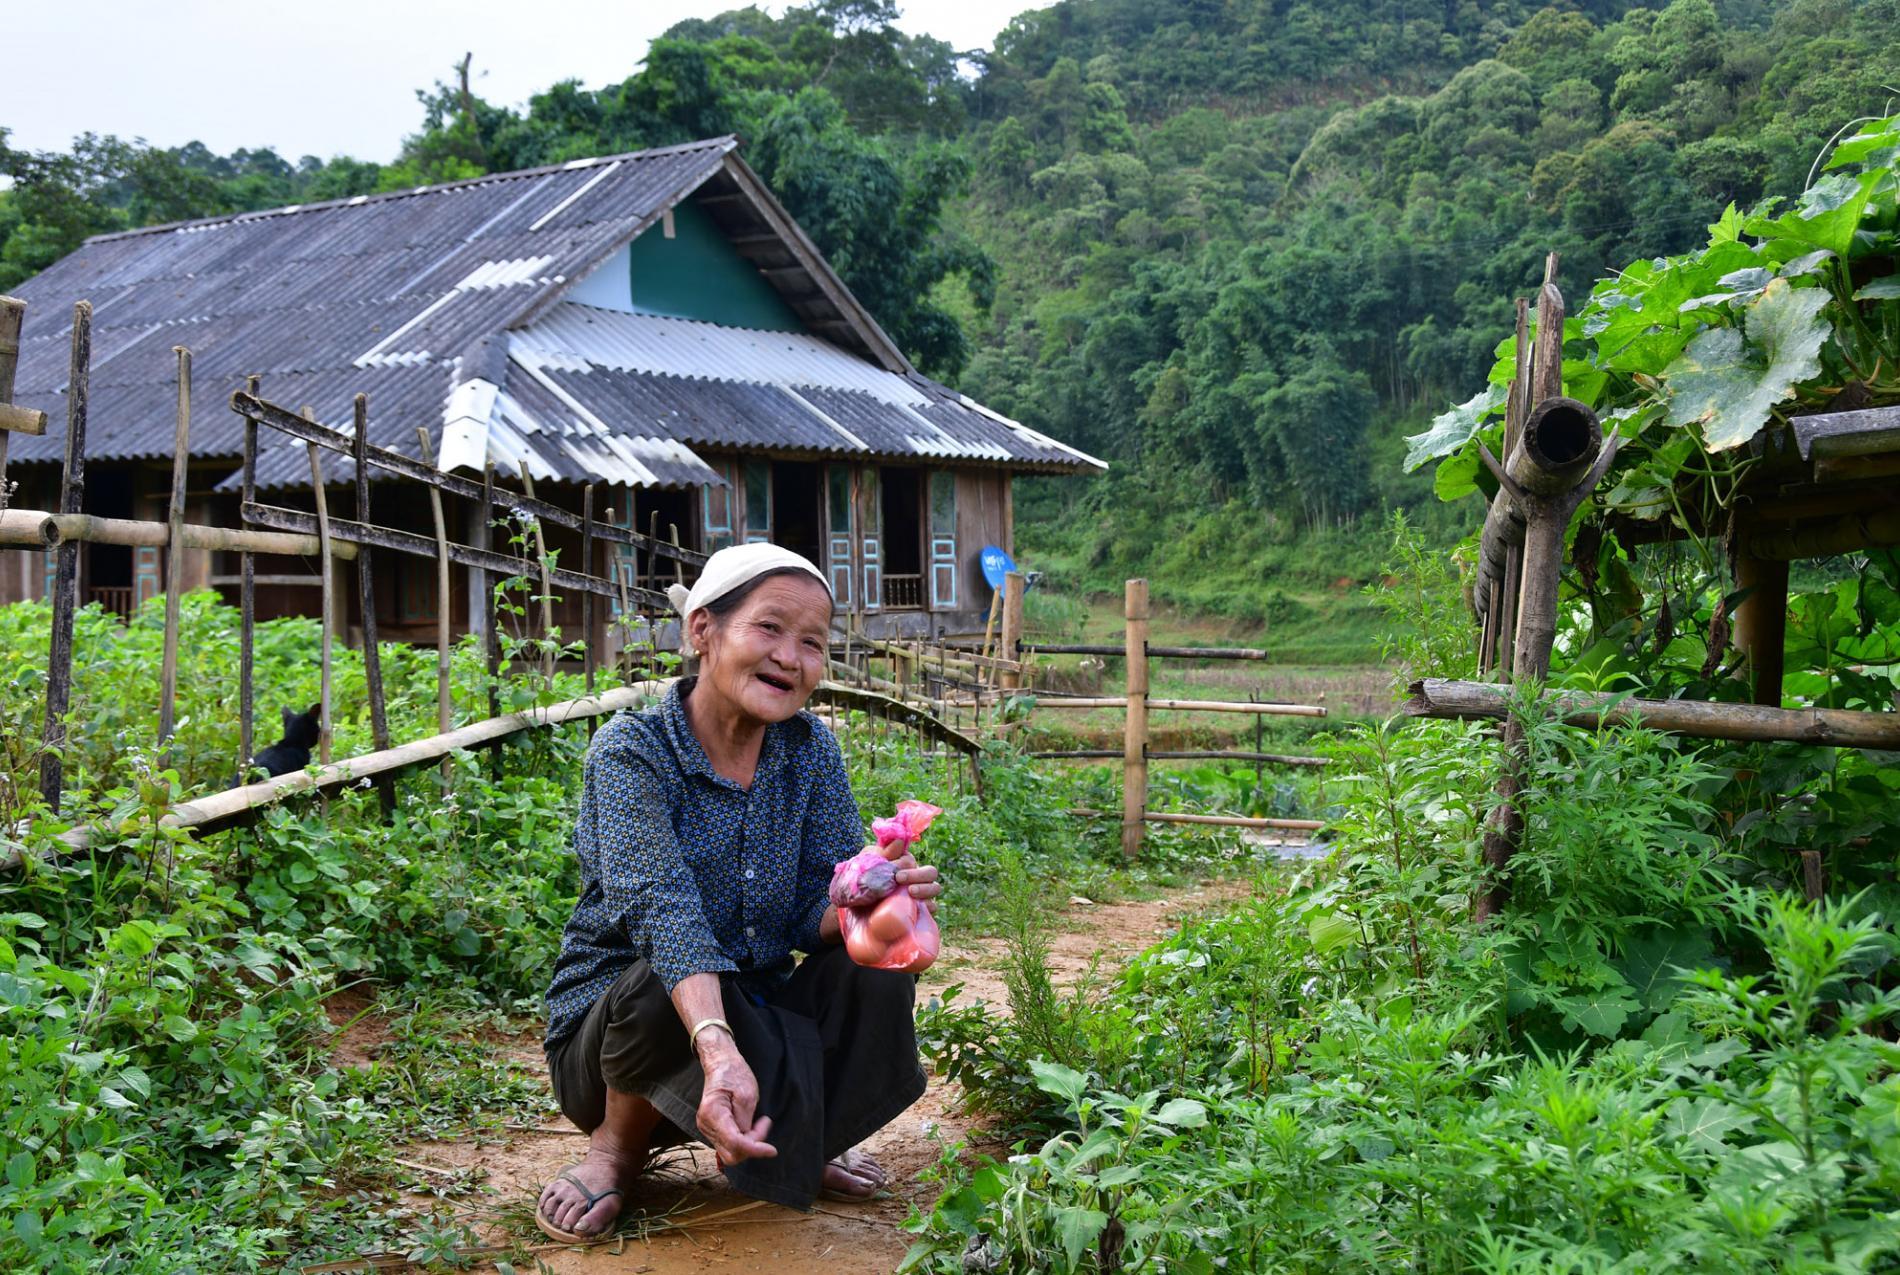 Voyage solidaire Vietnam : Vision du Monde - Photo 10